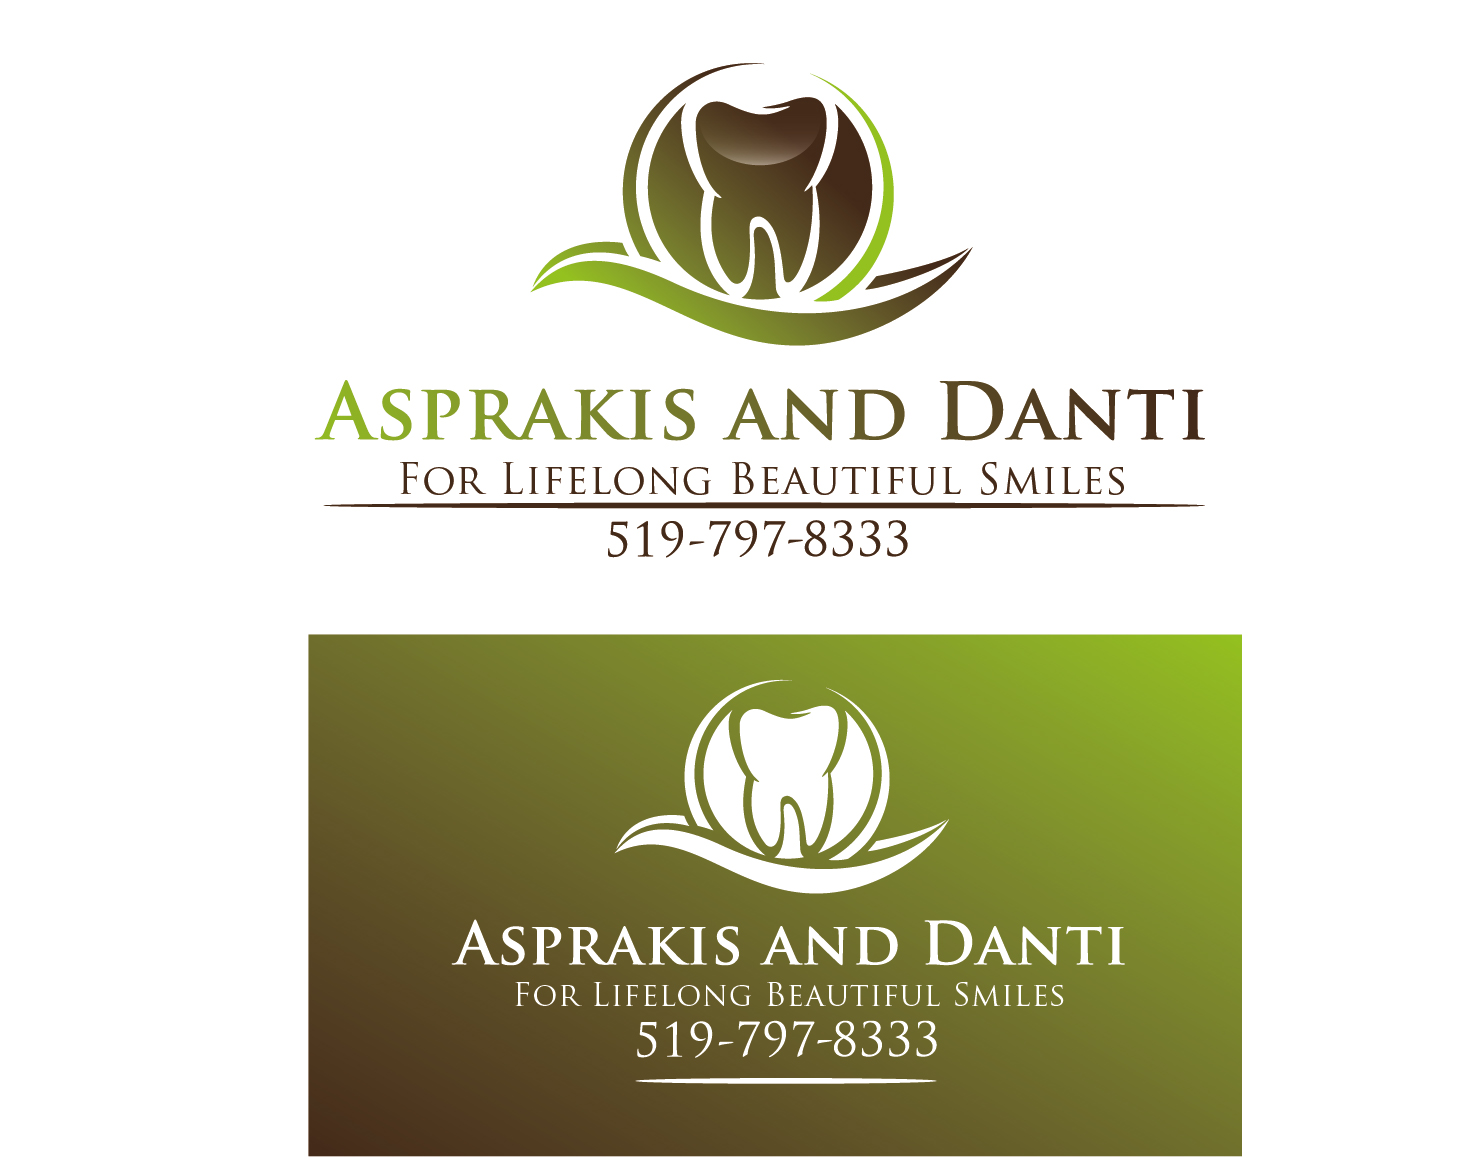 Logo Design by VENTSISLAV KOVACHEV - Entry No. 138 in the Logo Design Contest Unique Logo Design Wanted for Asprakis and Danti.